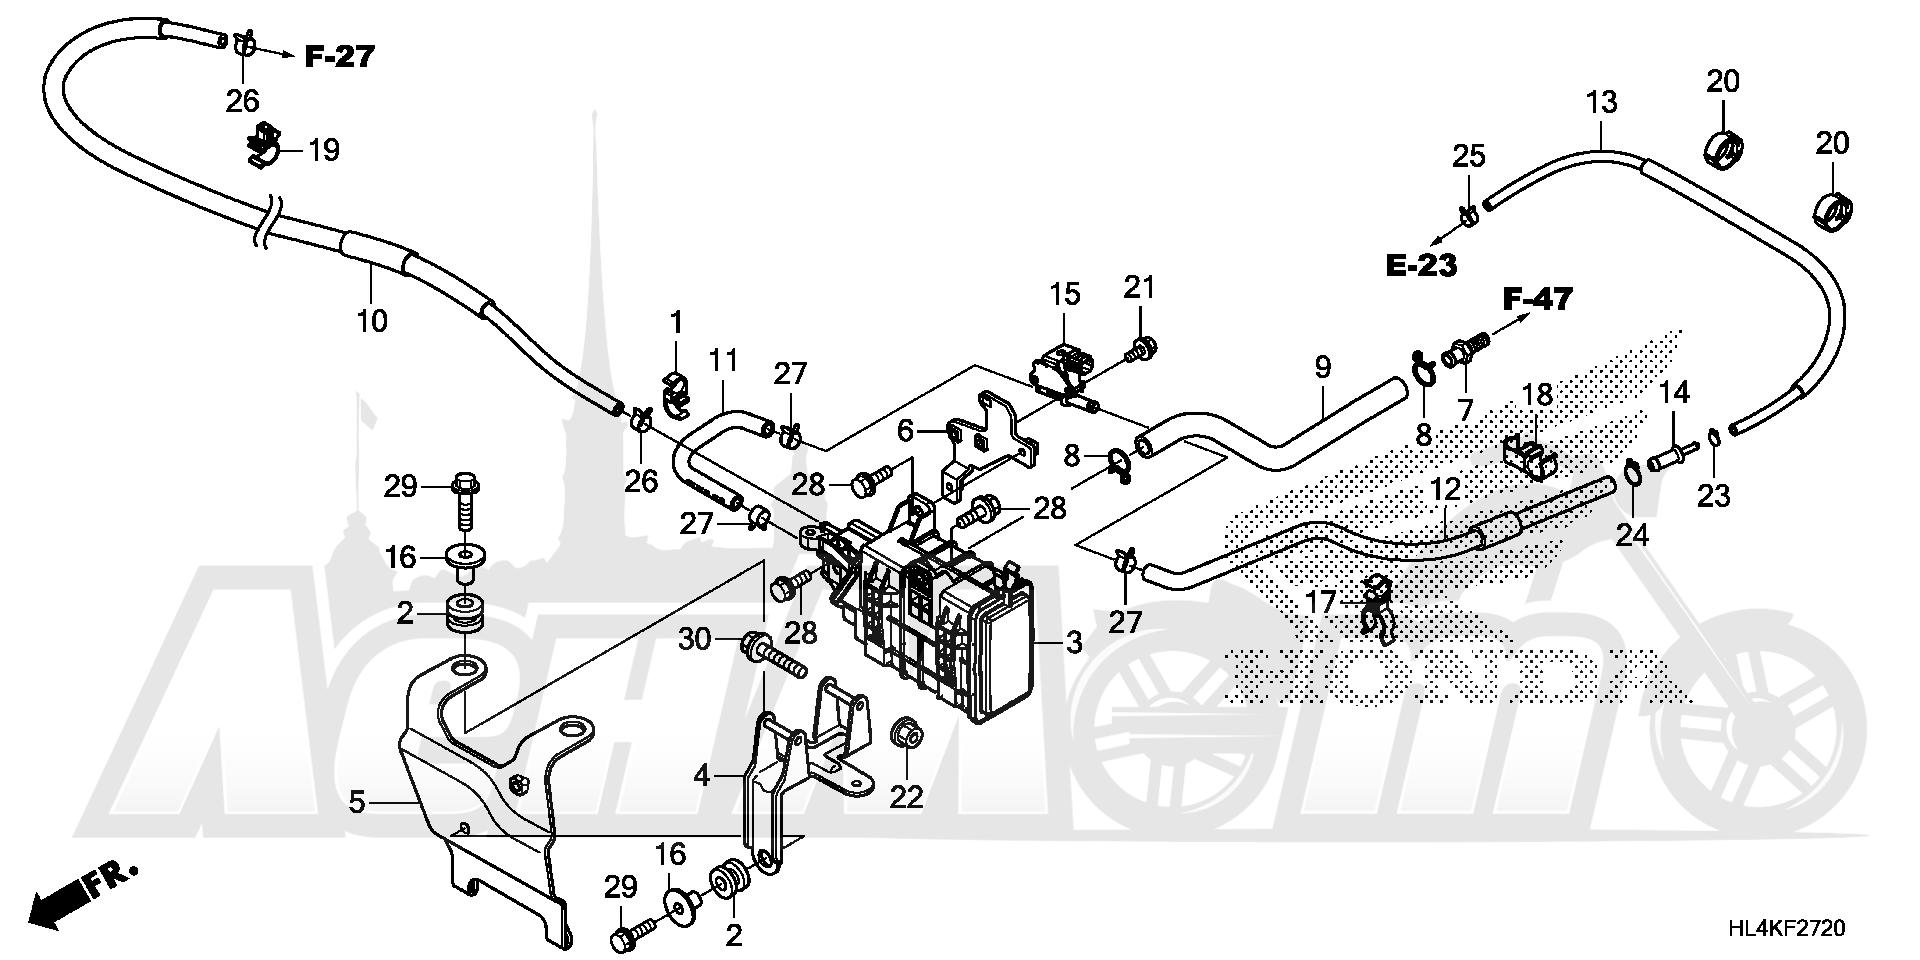 Запчасти для Квадроцикла Honda 2019 SXS1000M5D Раздел: EVAP CANISTER | EVAP канистра